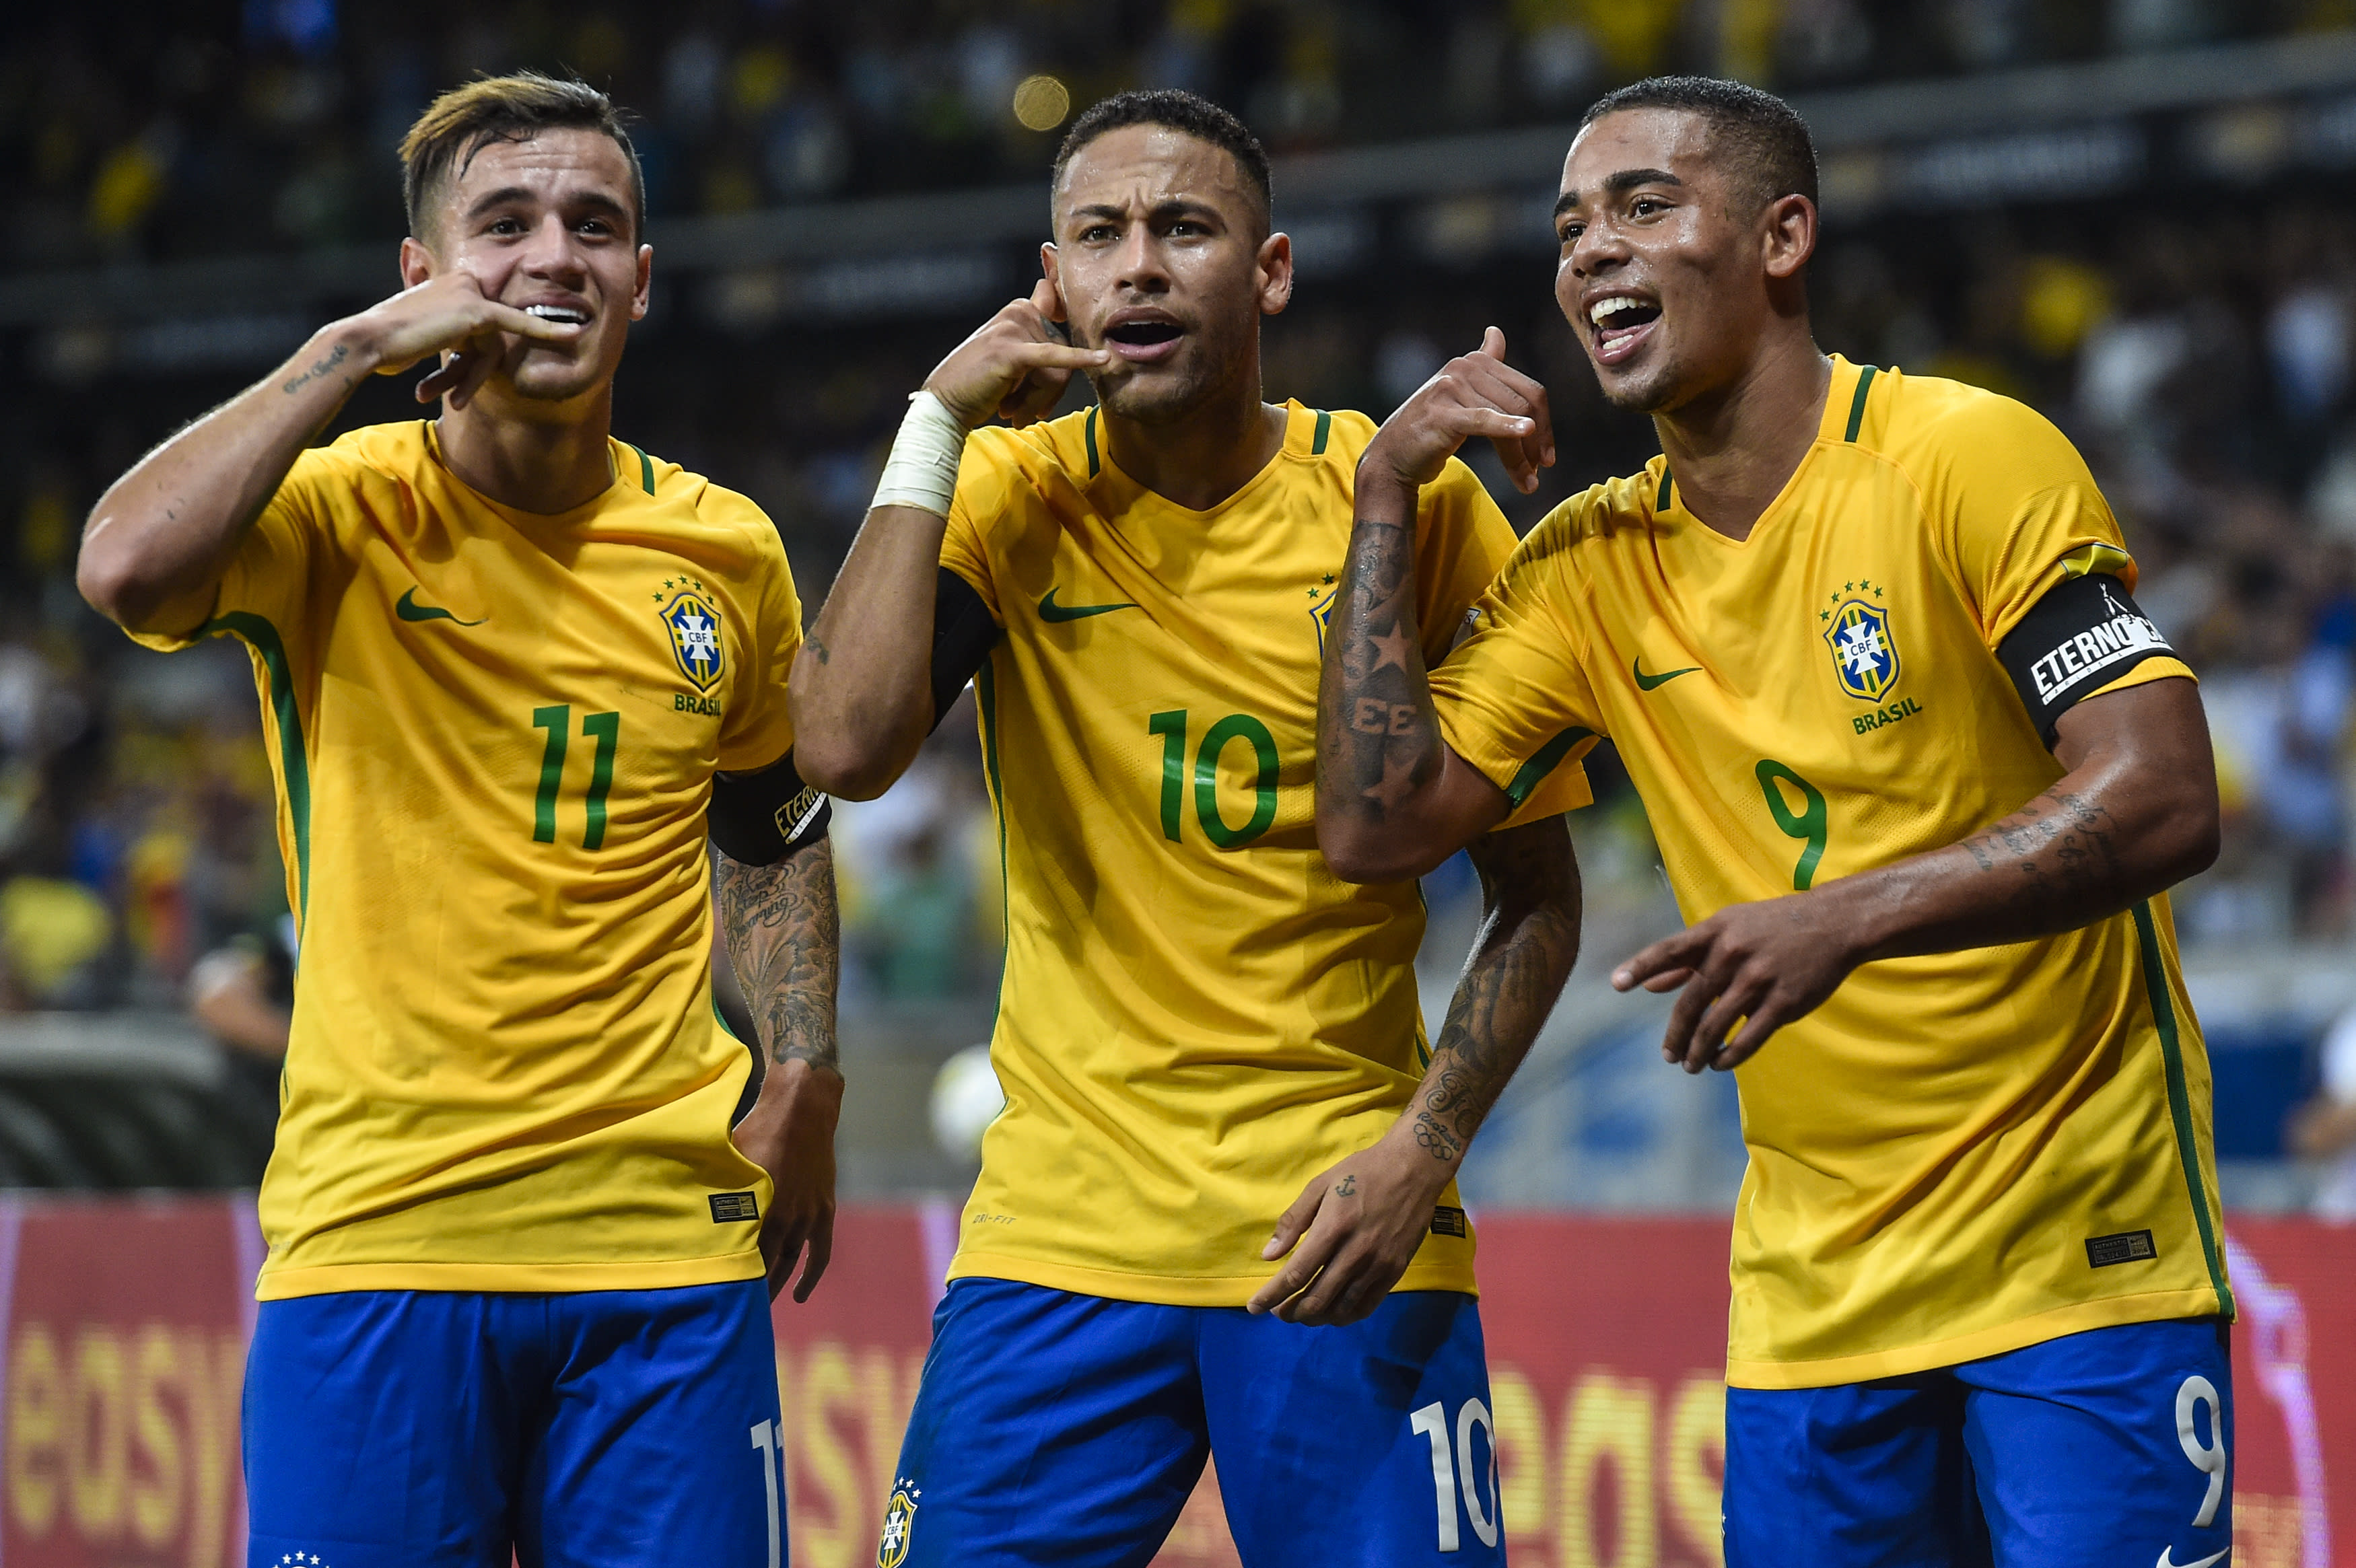 a21feff7227 Brazil World Cup 2018 preview: Lineup, tactics, predictions